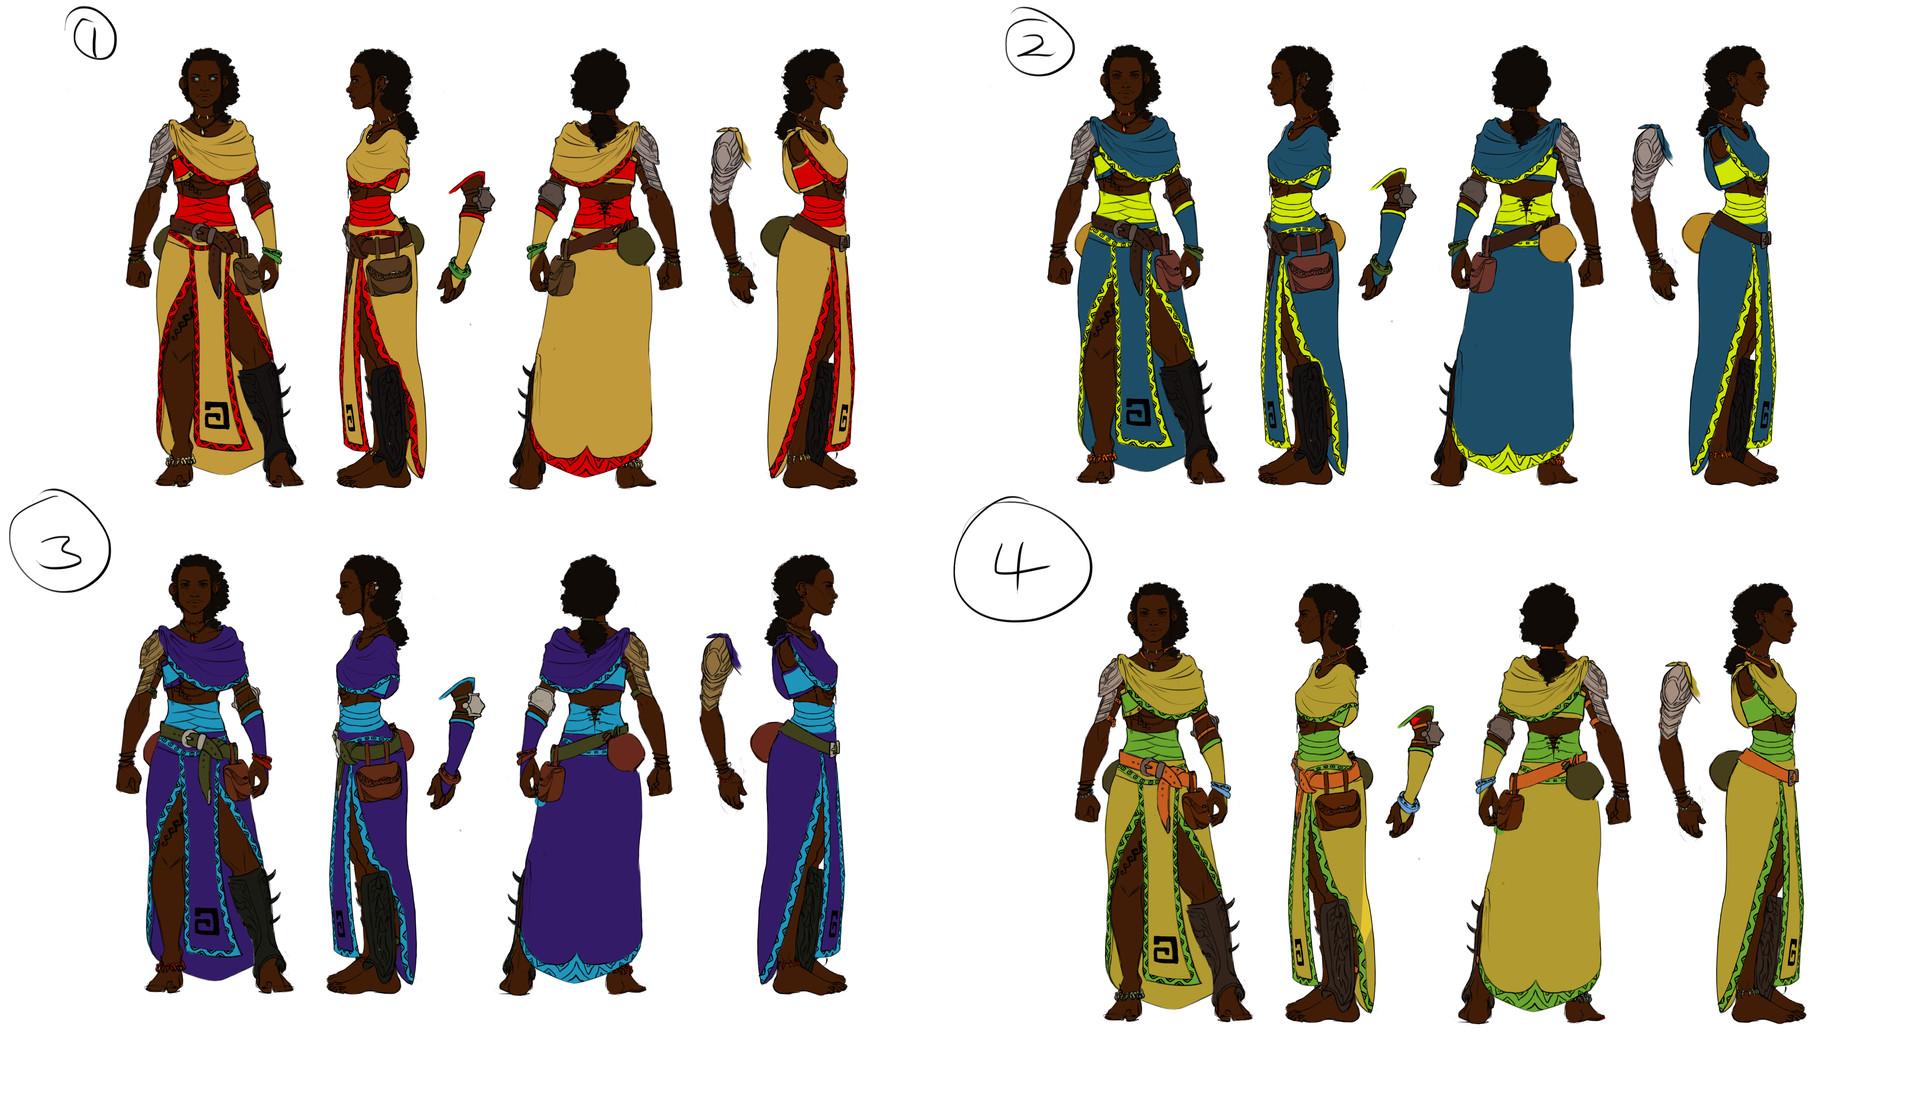 Elizabeth ware bamako3 colors